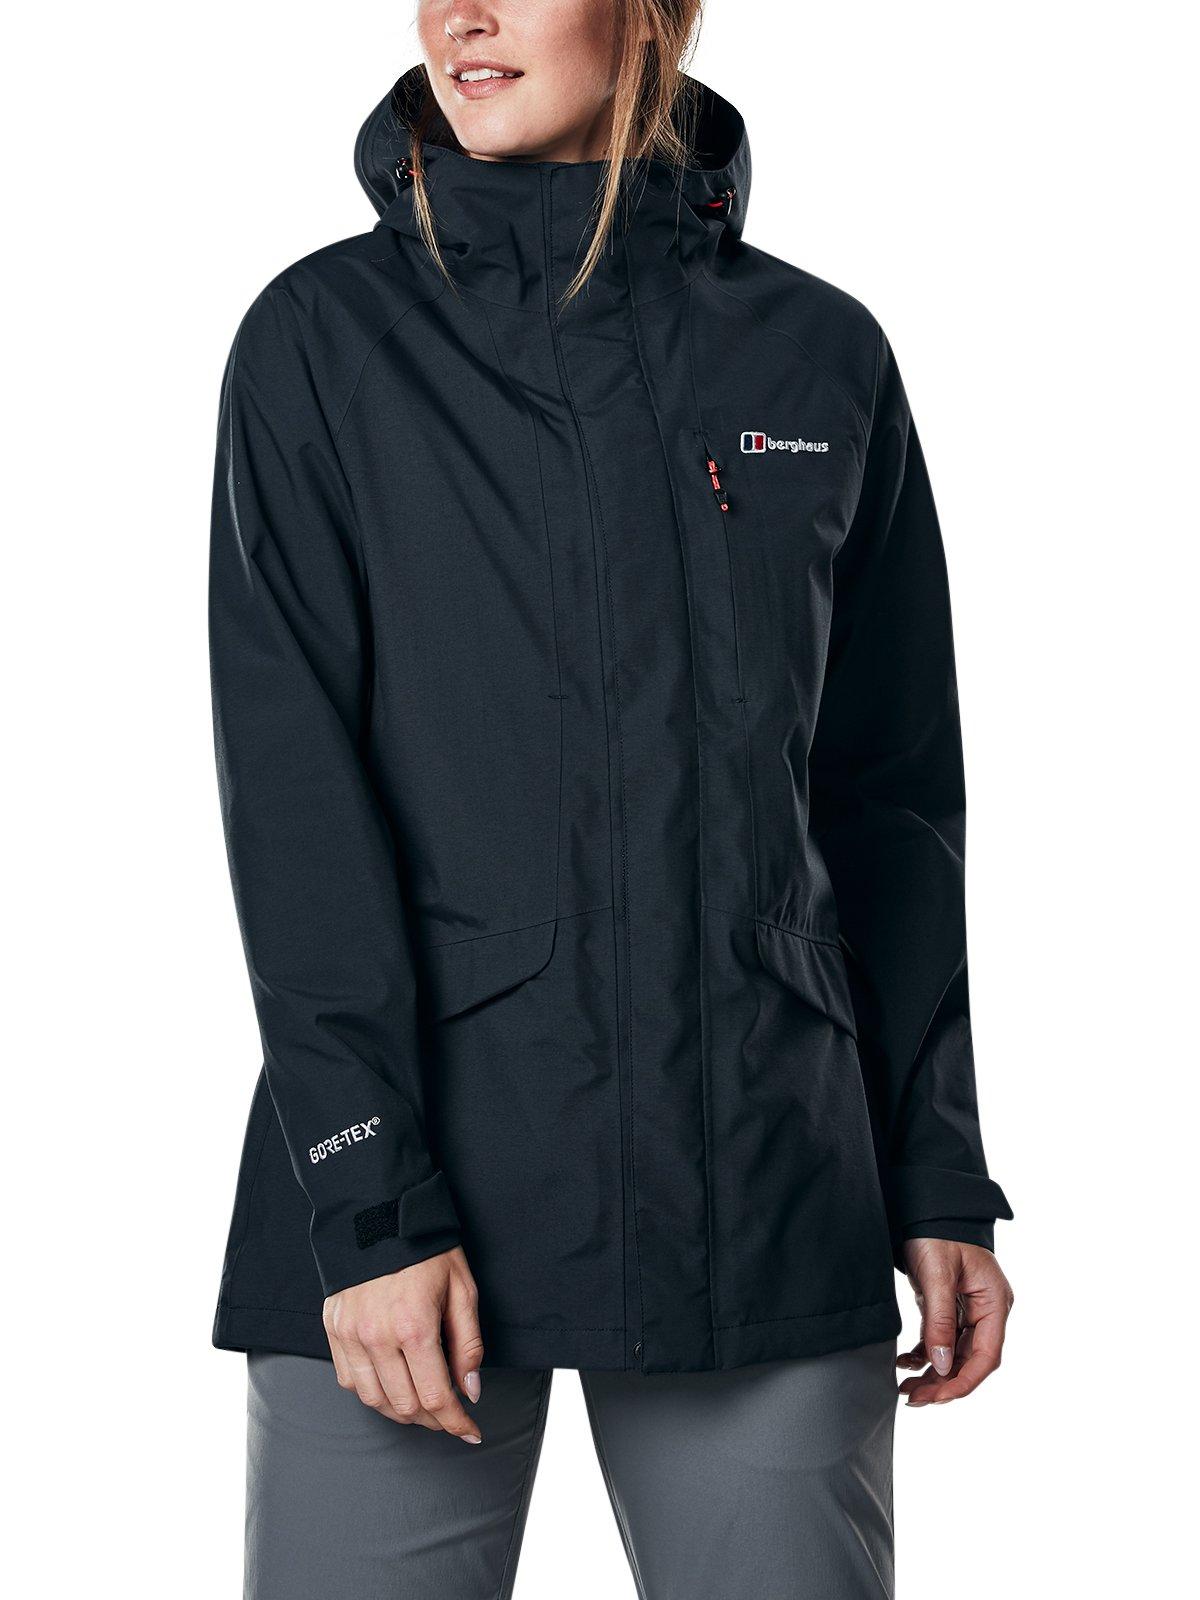 71ShSt5PP9L - Berghaus Women's Hillmaster Gore-tex Waterproof Jacket